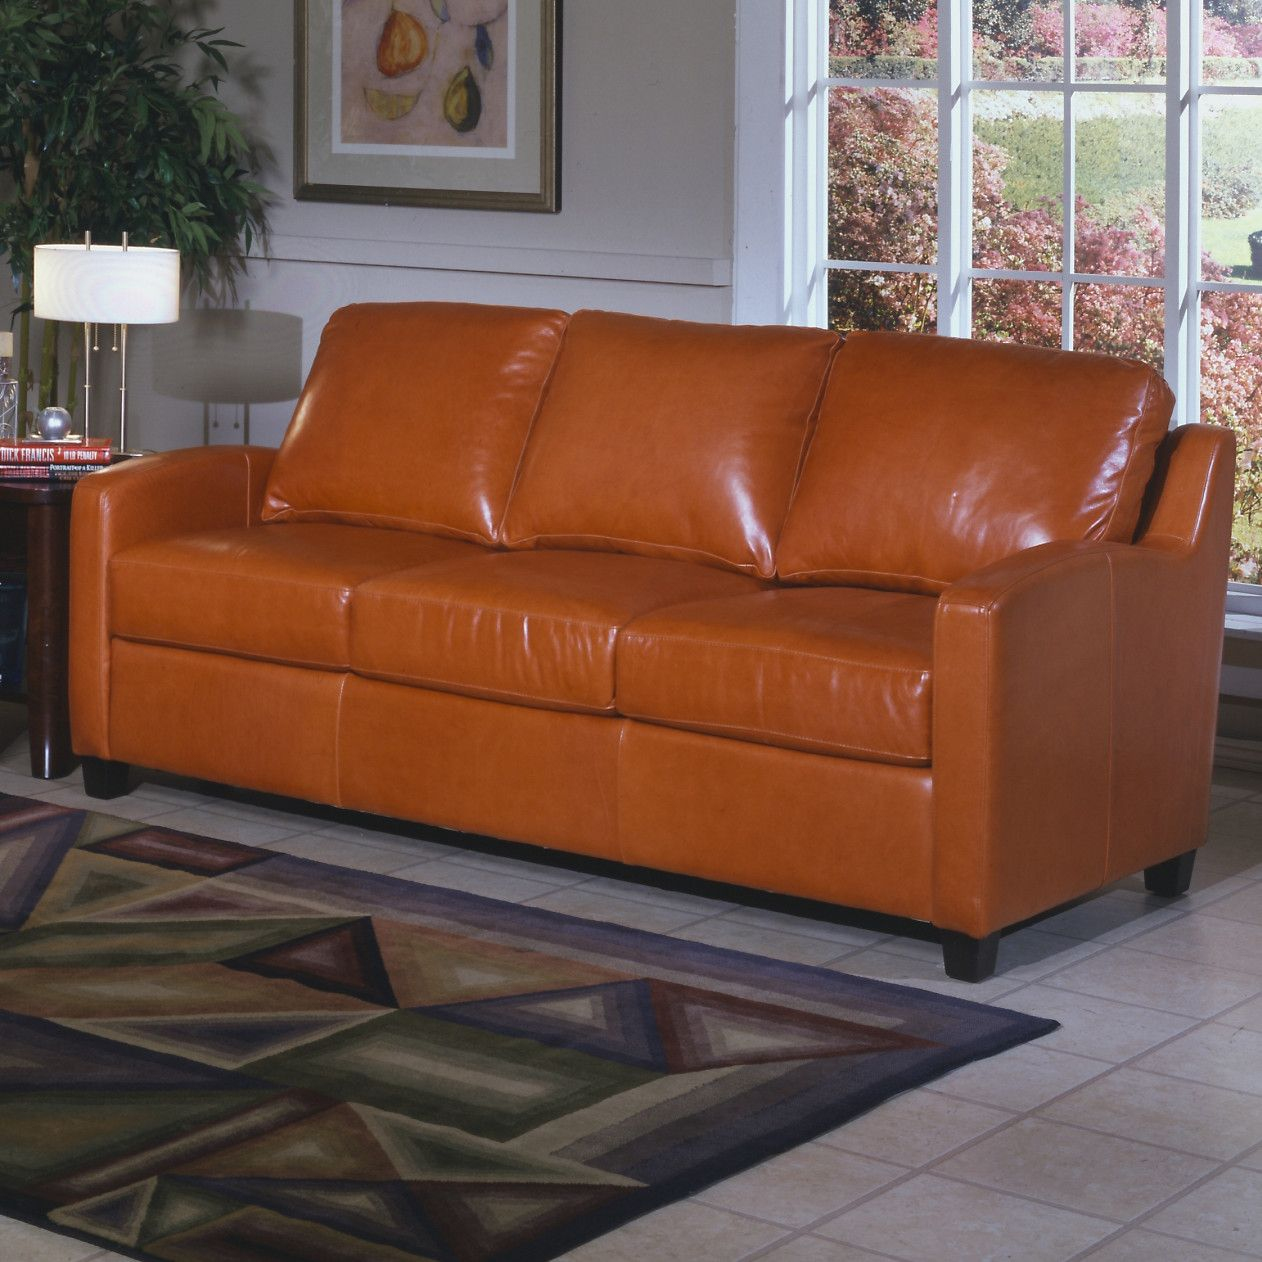 Canapé Convertible Ikea Occasion Luxe Collection 30 élégant Occasion Canapé Cuir